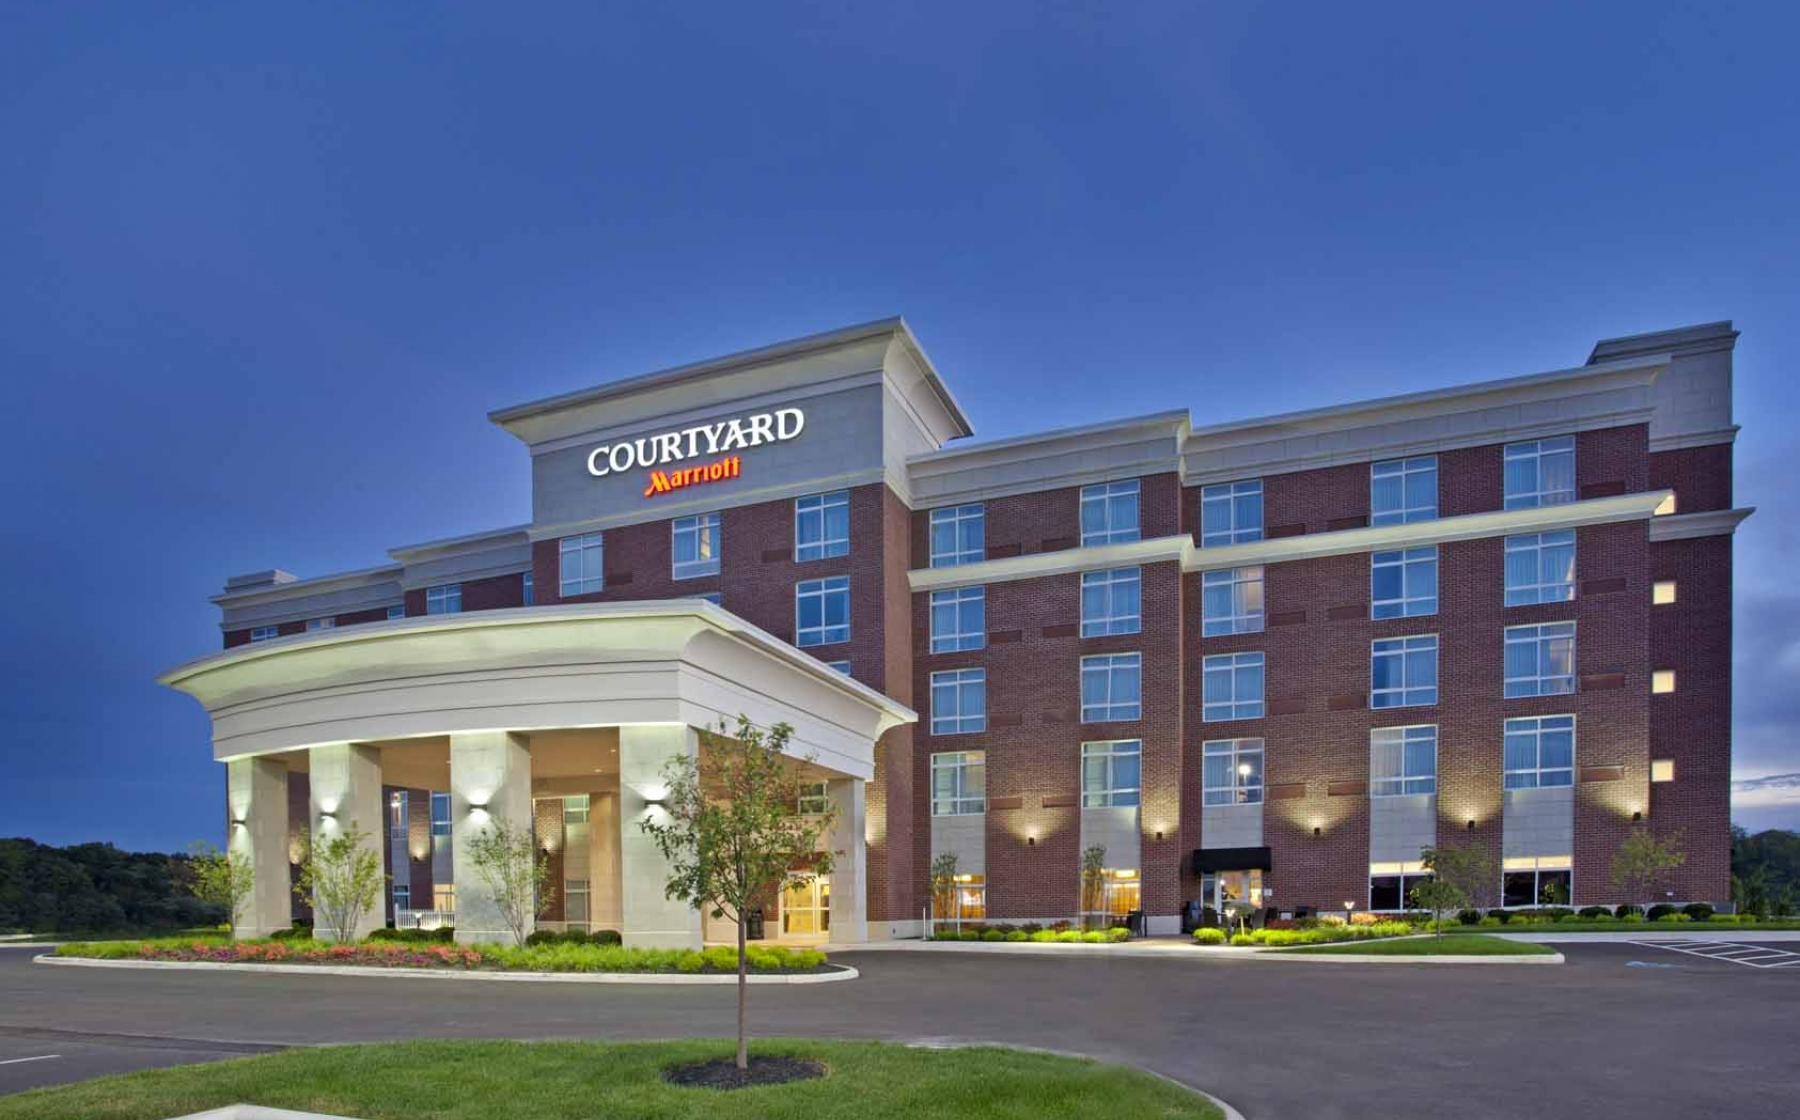 Courtyard architectural design inc for Parks garden center canfield ohio